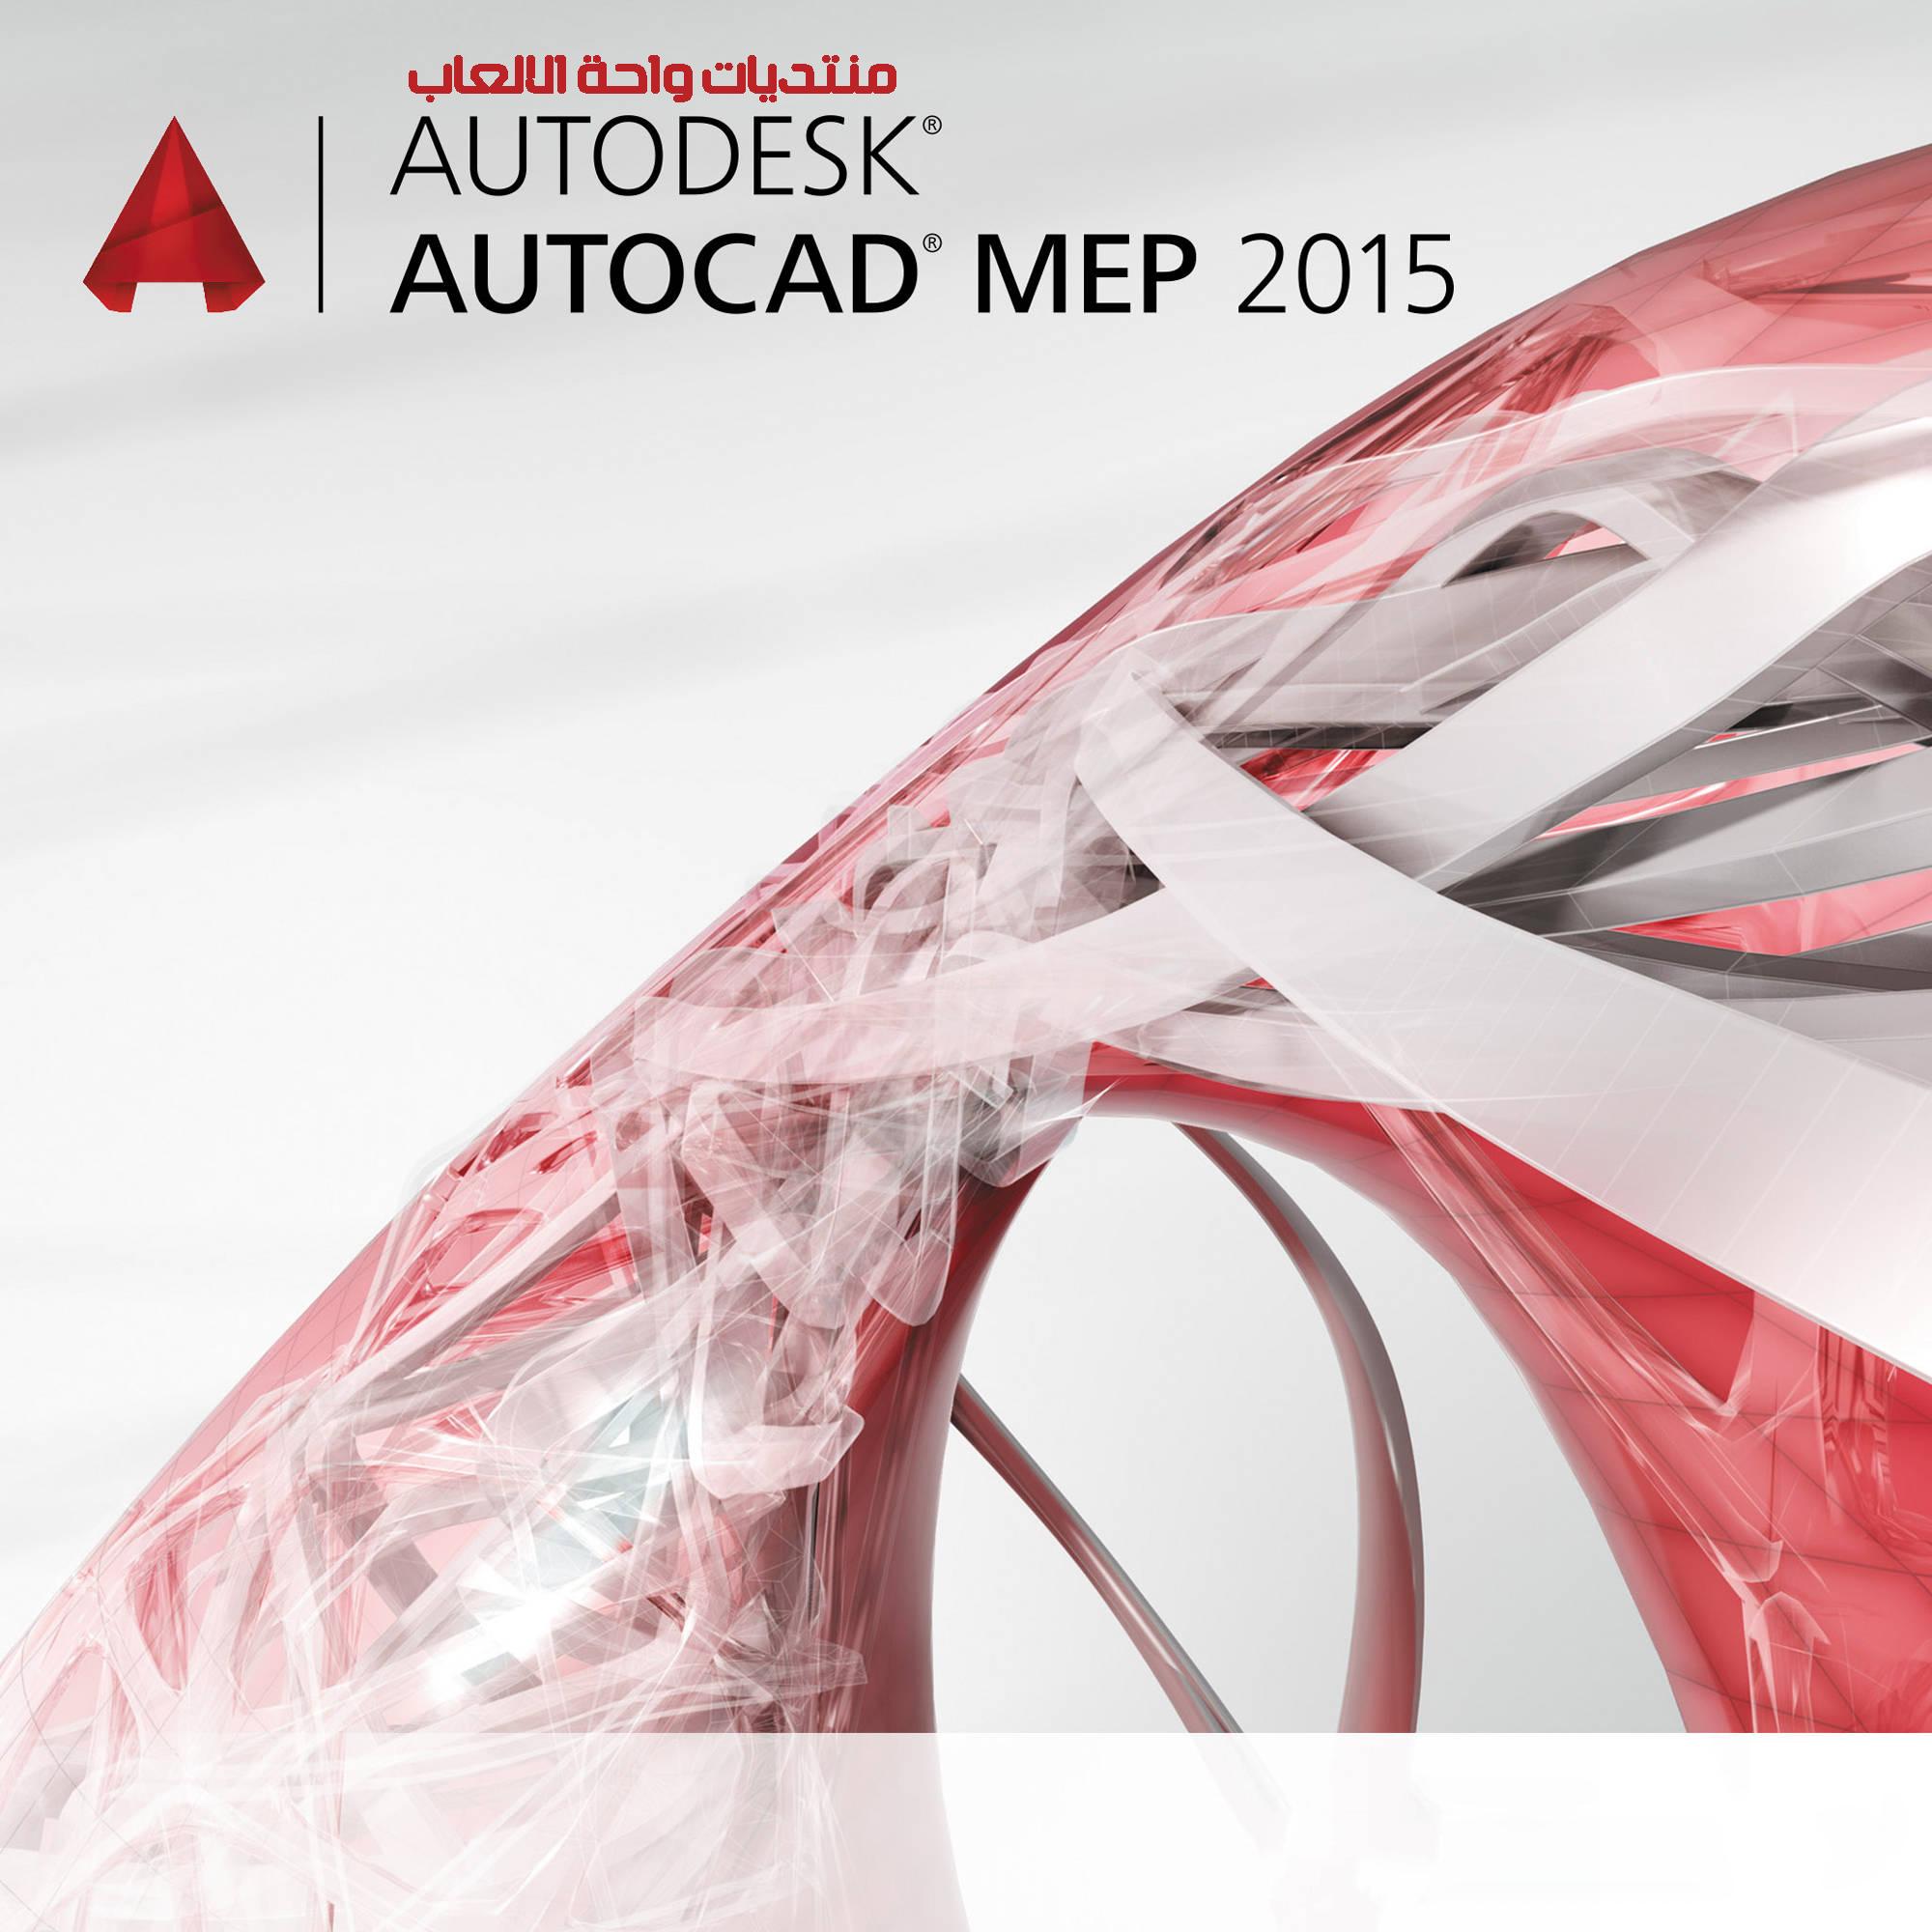 Autodesk AutoCad 2020 Autodesk AutoCad YV3rk.png